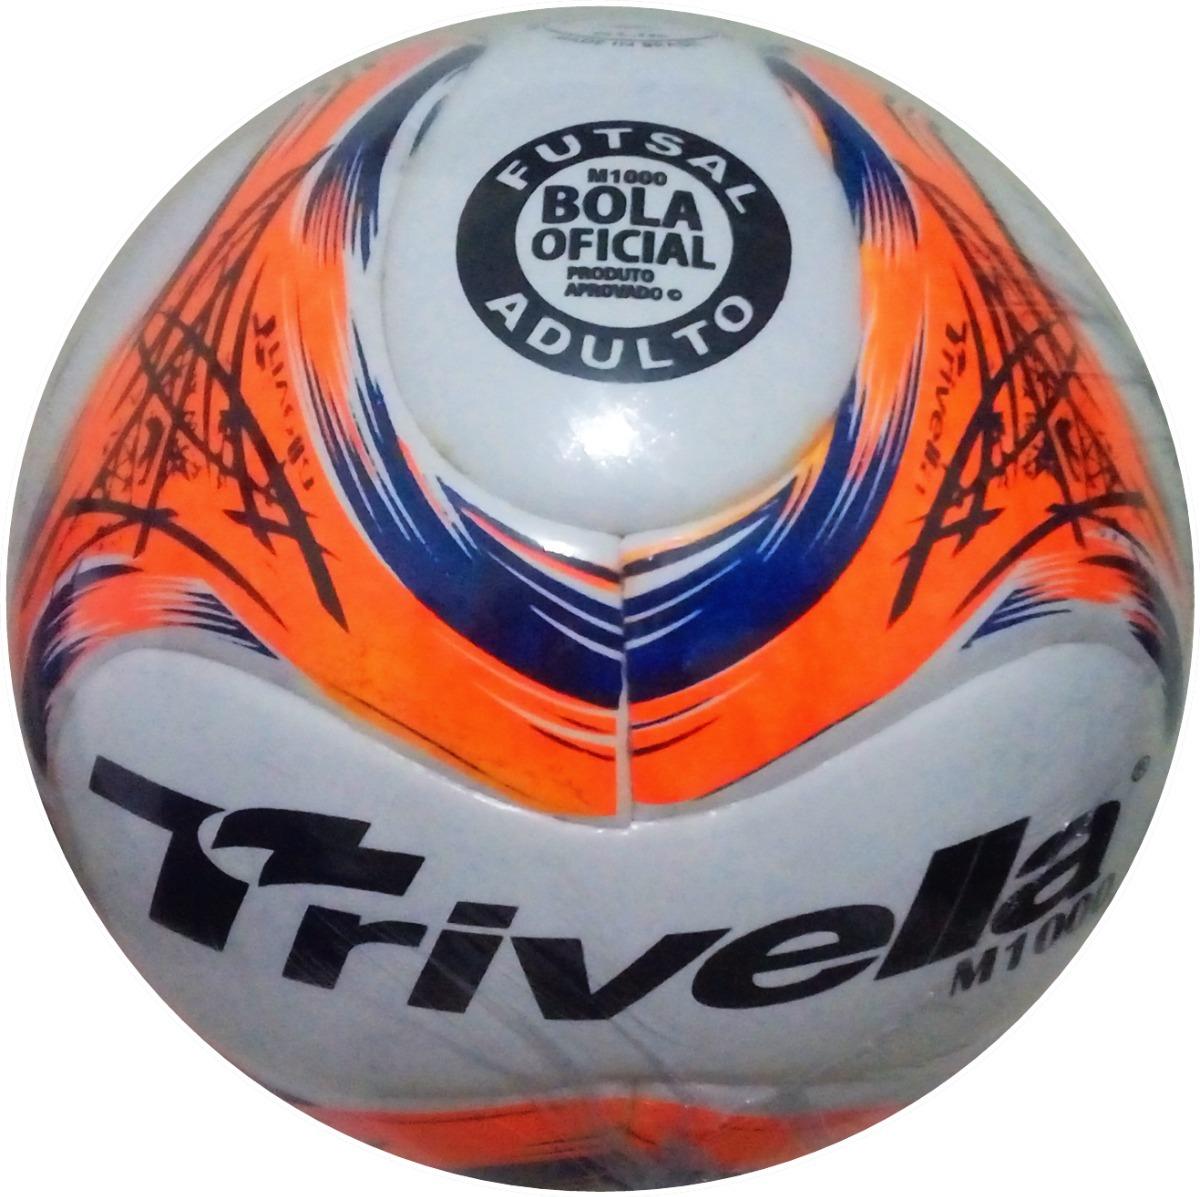 Bola Futsal Futebol Trivella Original Promoção - Brasil Gold - R  60 ... e59a2ed3698bf